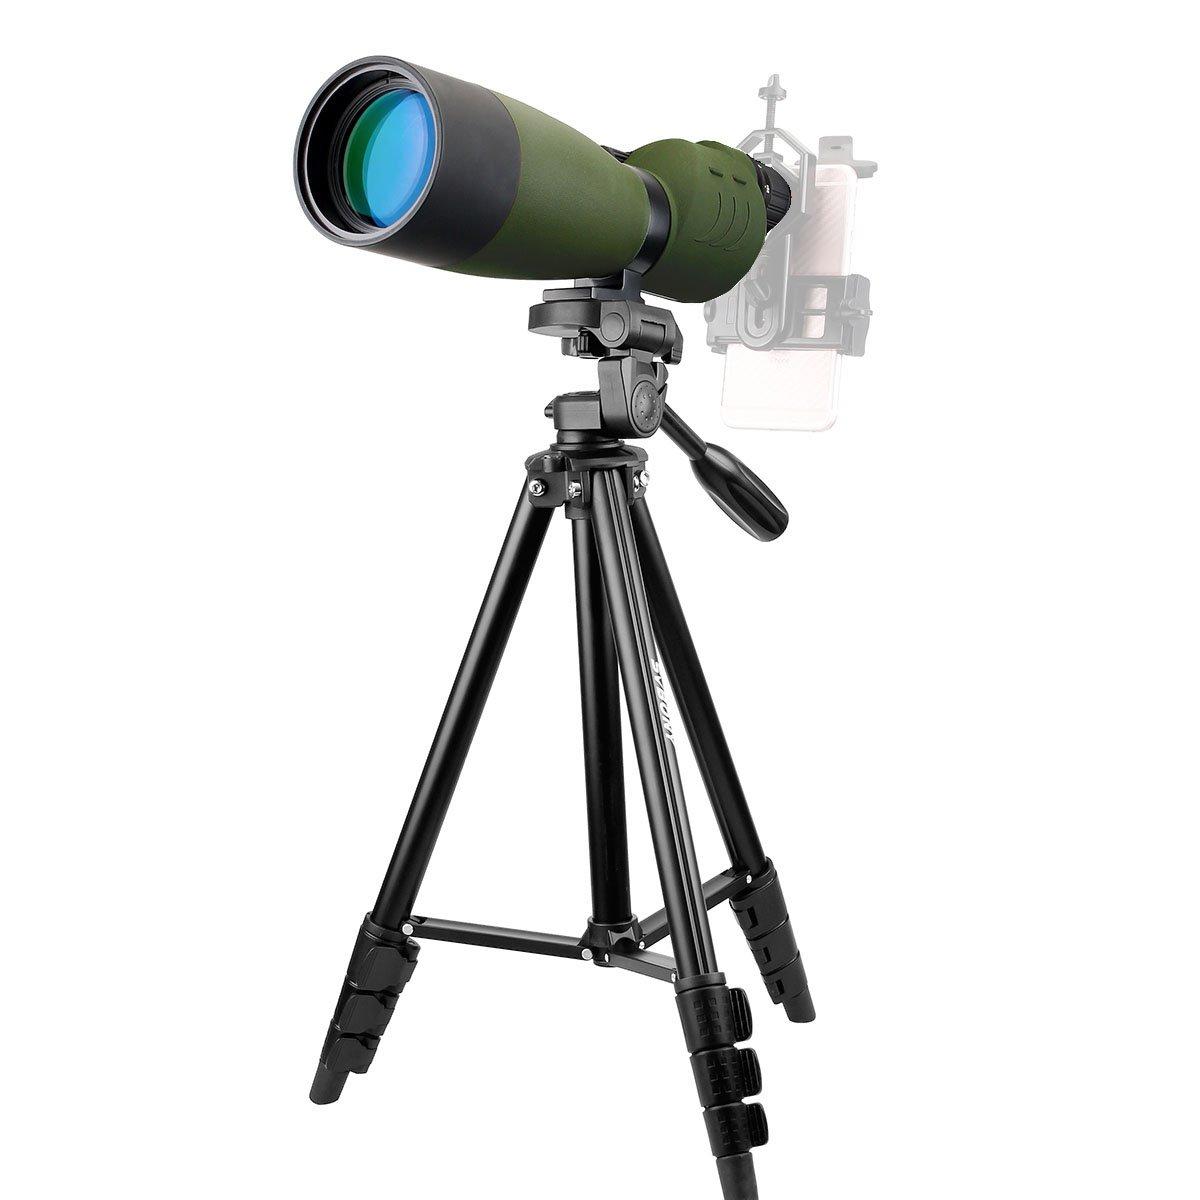 SVBONY SV17 Spotting Scope for Target Shooting Straight scope pic-5